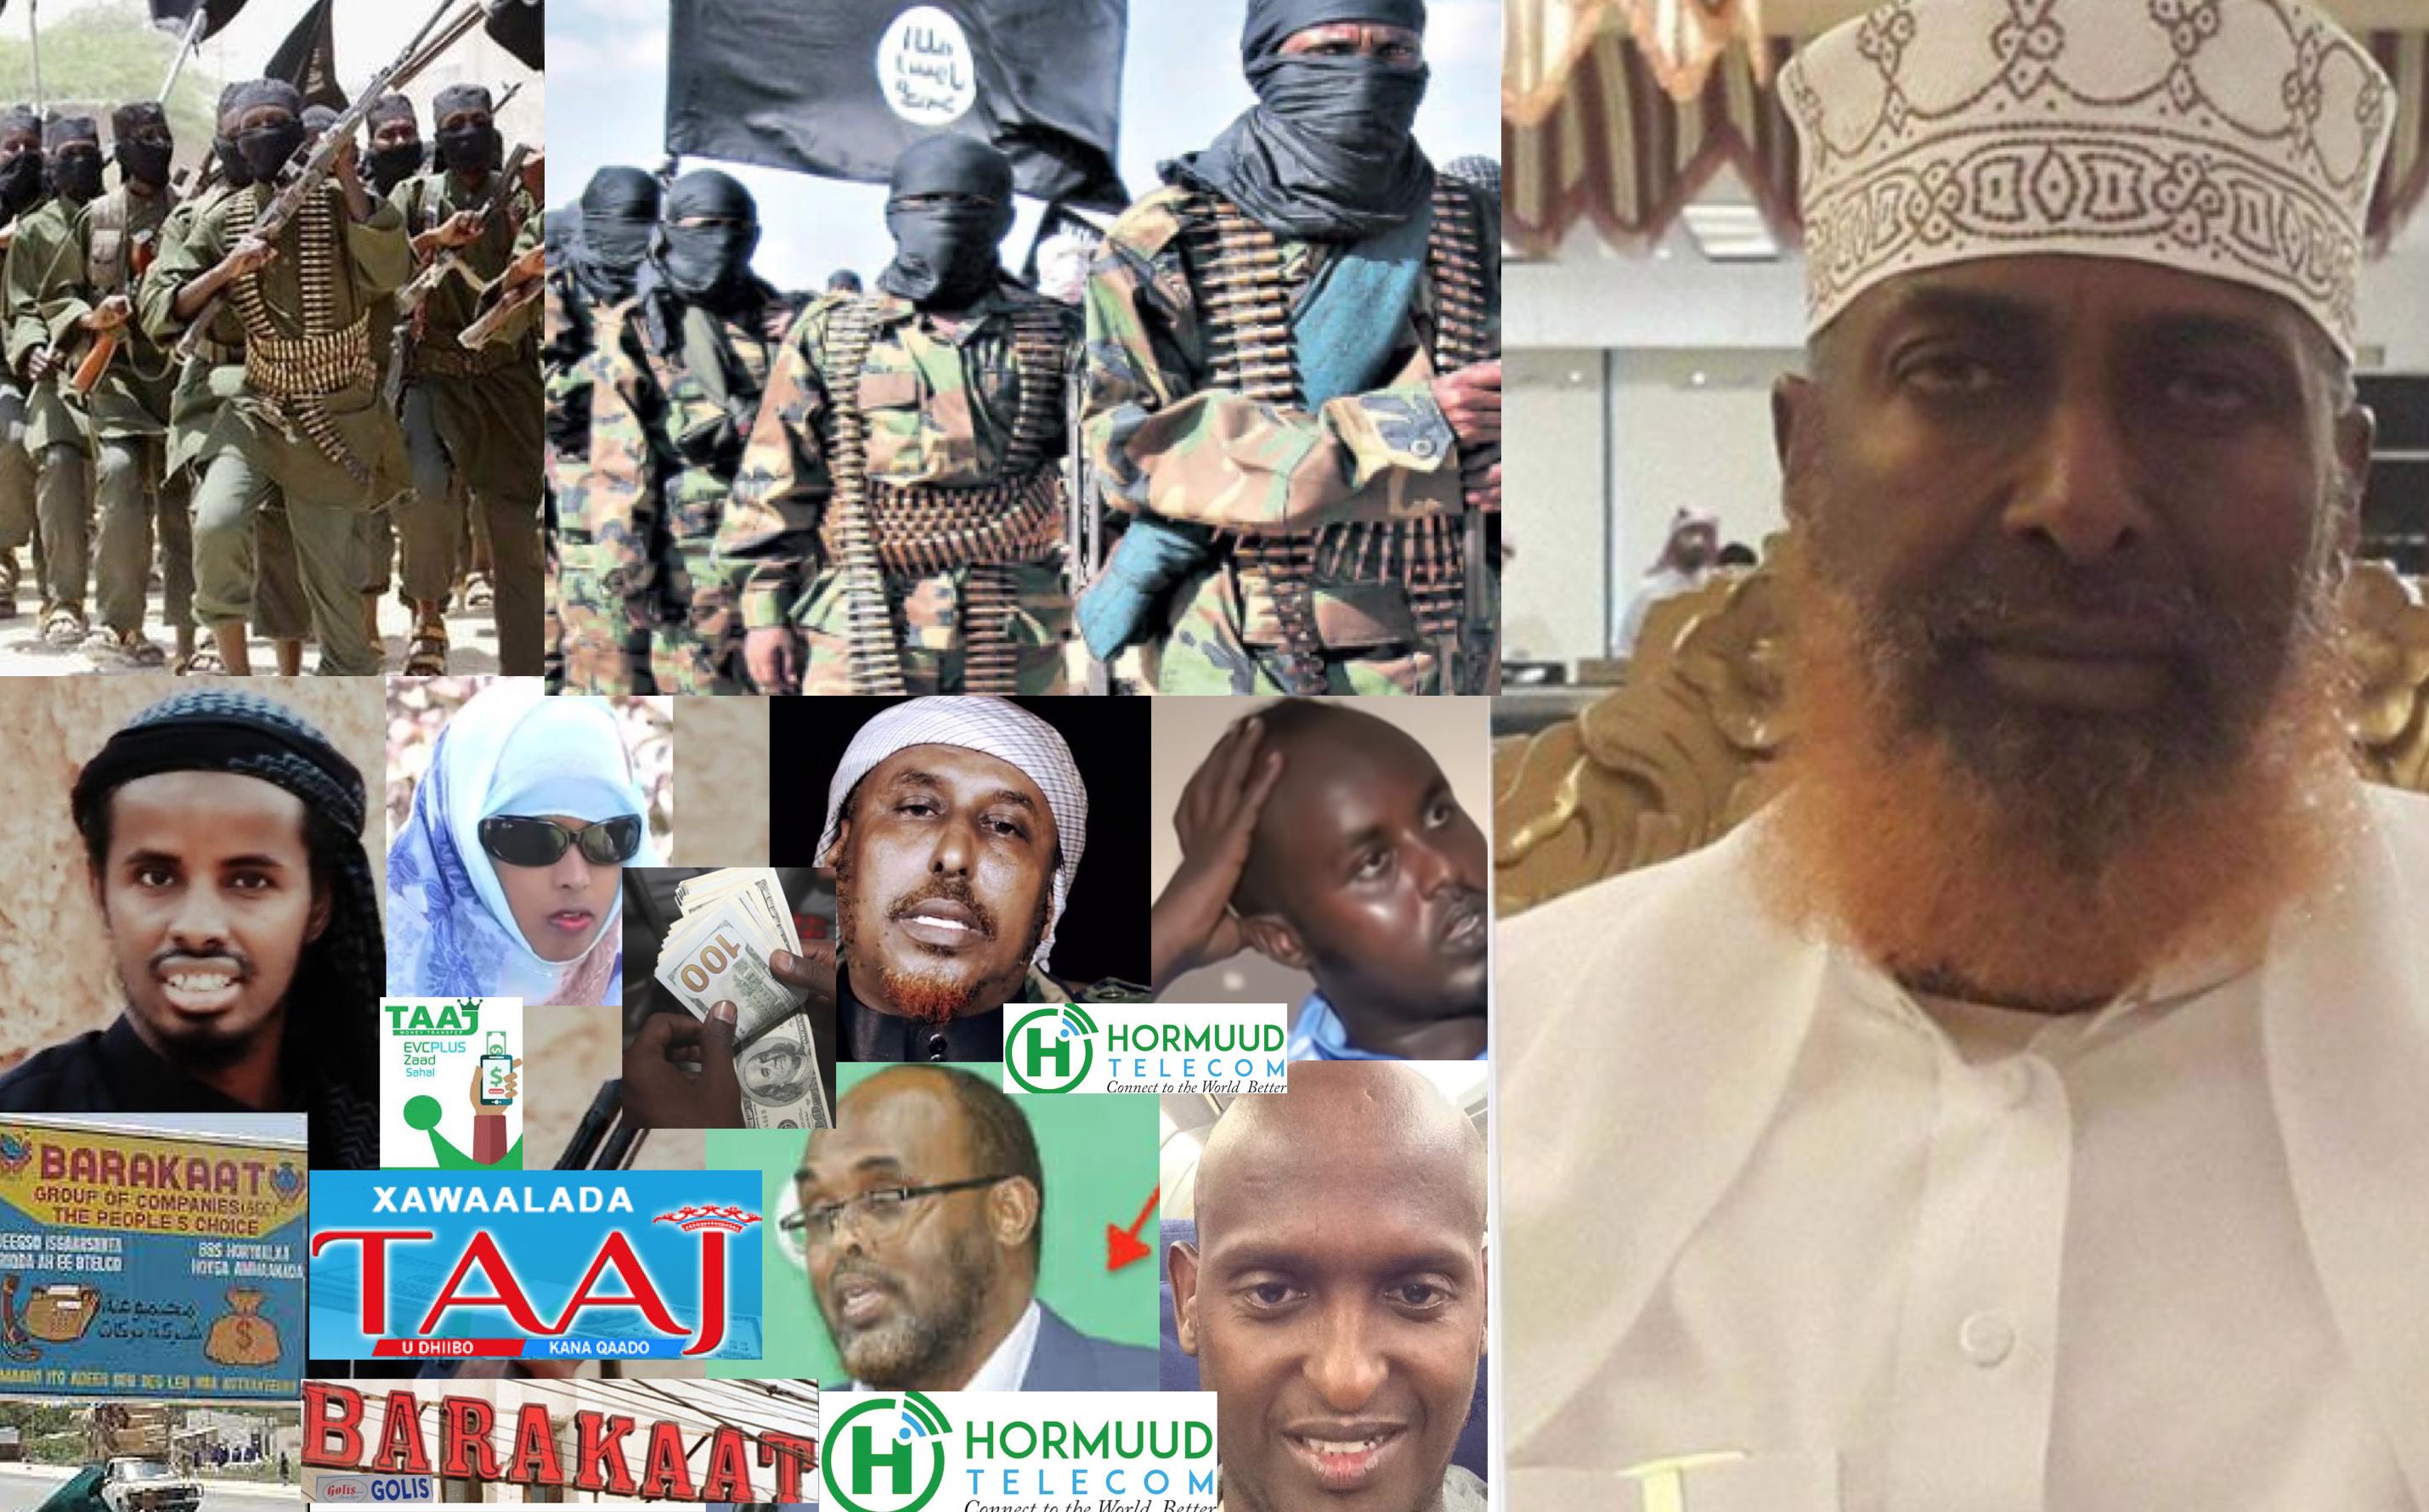 Somalia:Hormuud Telecom staff members who joined the terrorists.